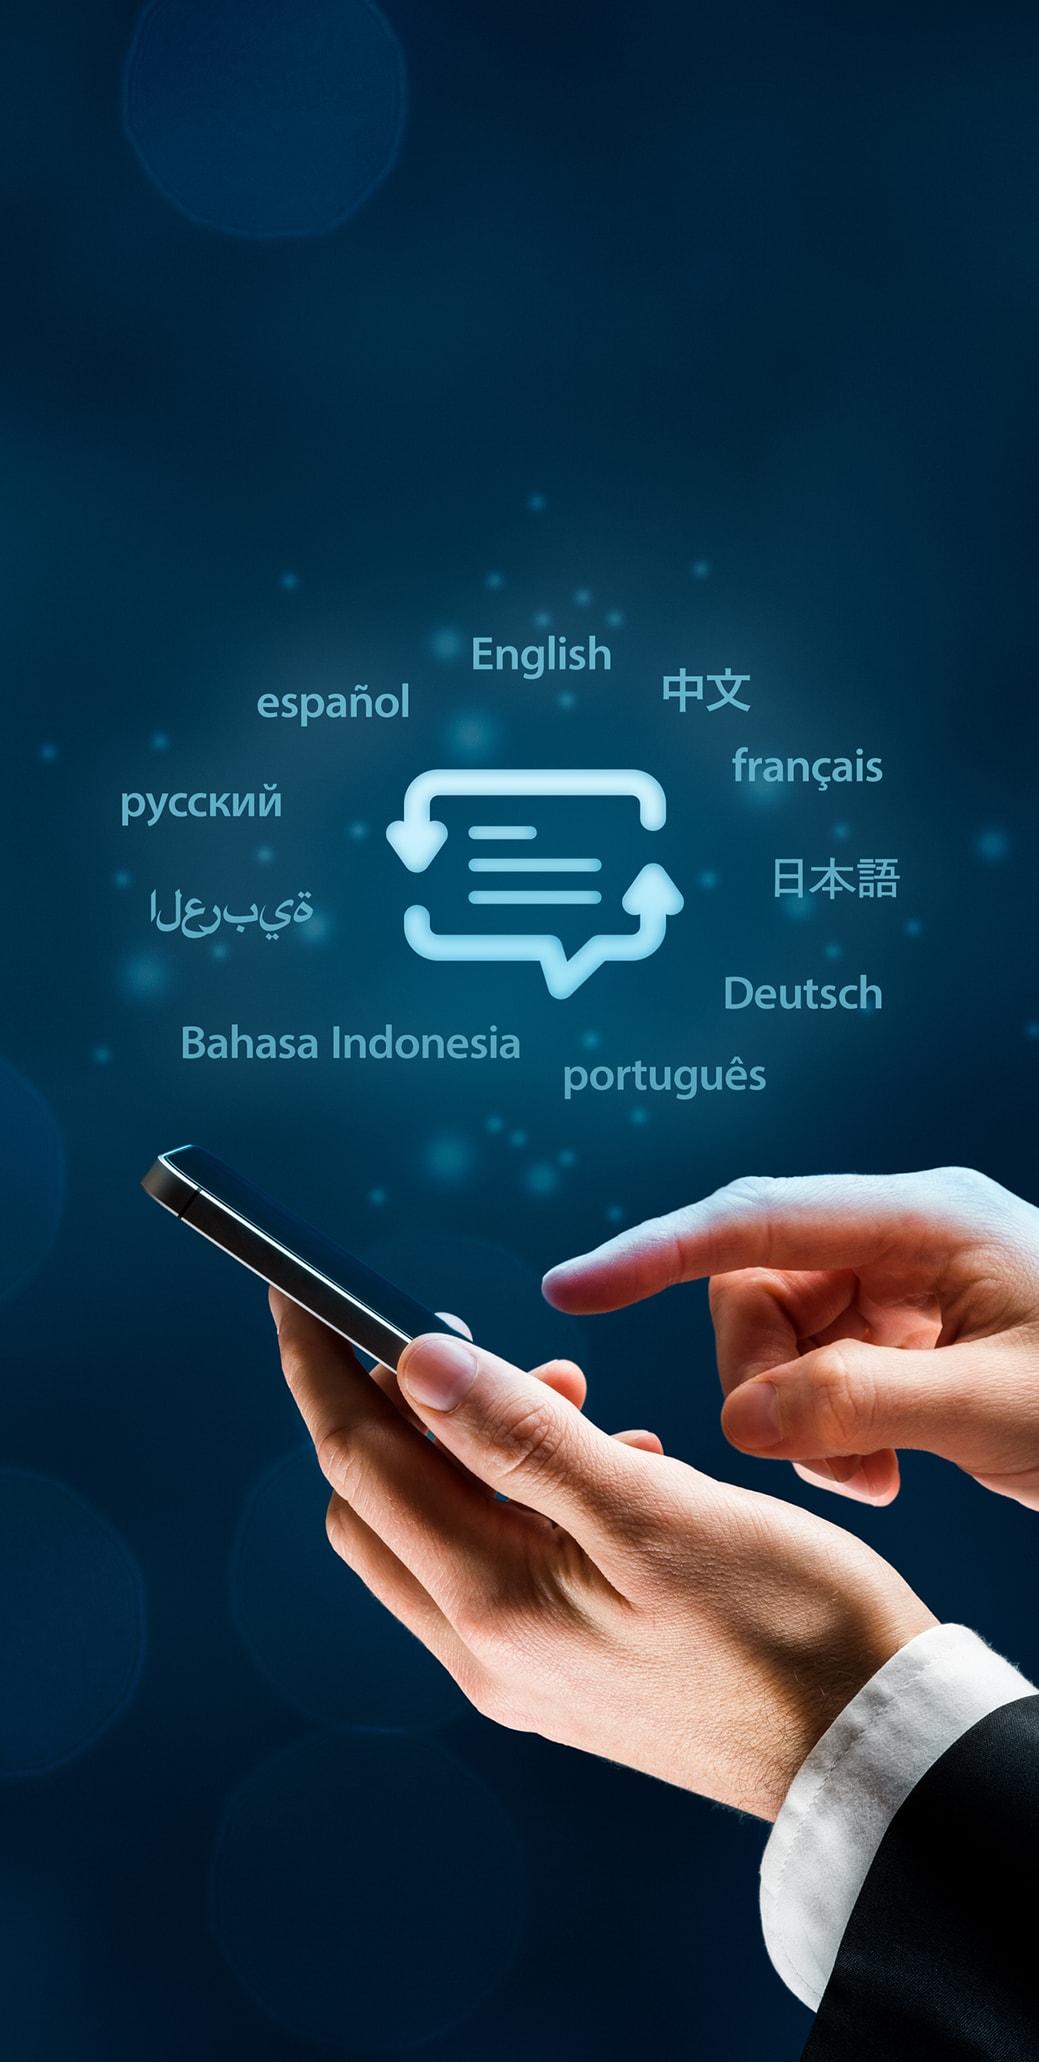 fluently/2020-12-17-2we311vkiszwzrt-ZlWTHlLA--iStock-1027128864-min.jpg